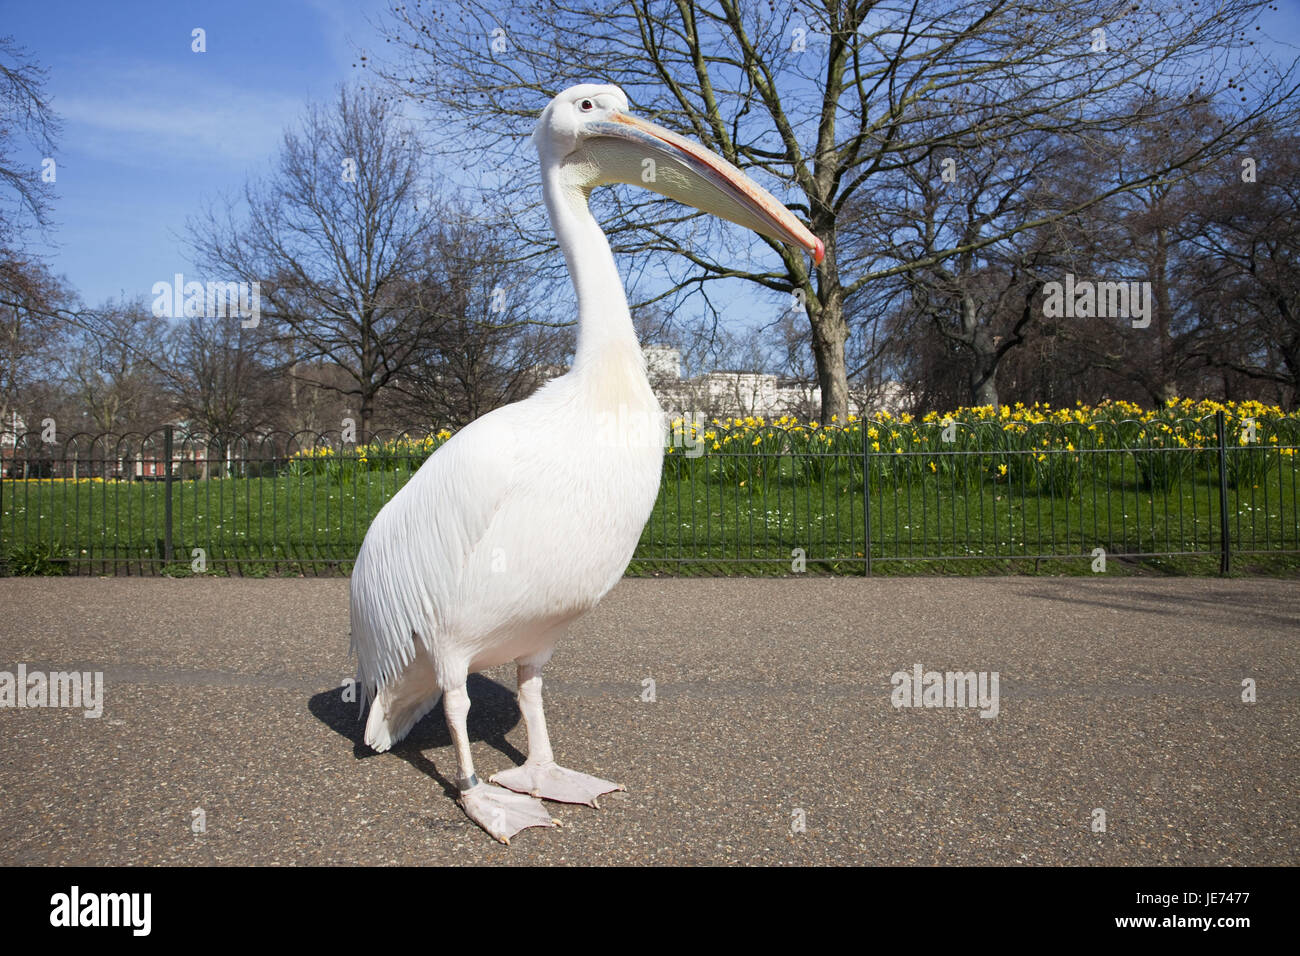 England, London, St. of James park, pelican, at the side, animals, park, spring, Pelecanidae, Pelecanus, water birds, - Stock Image